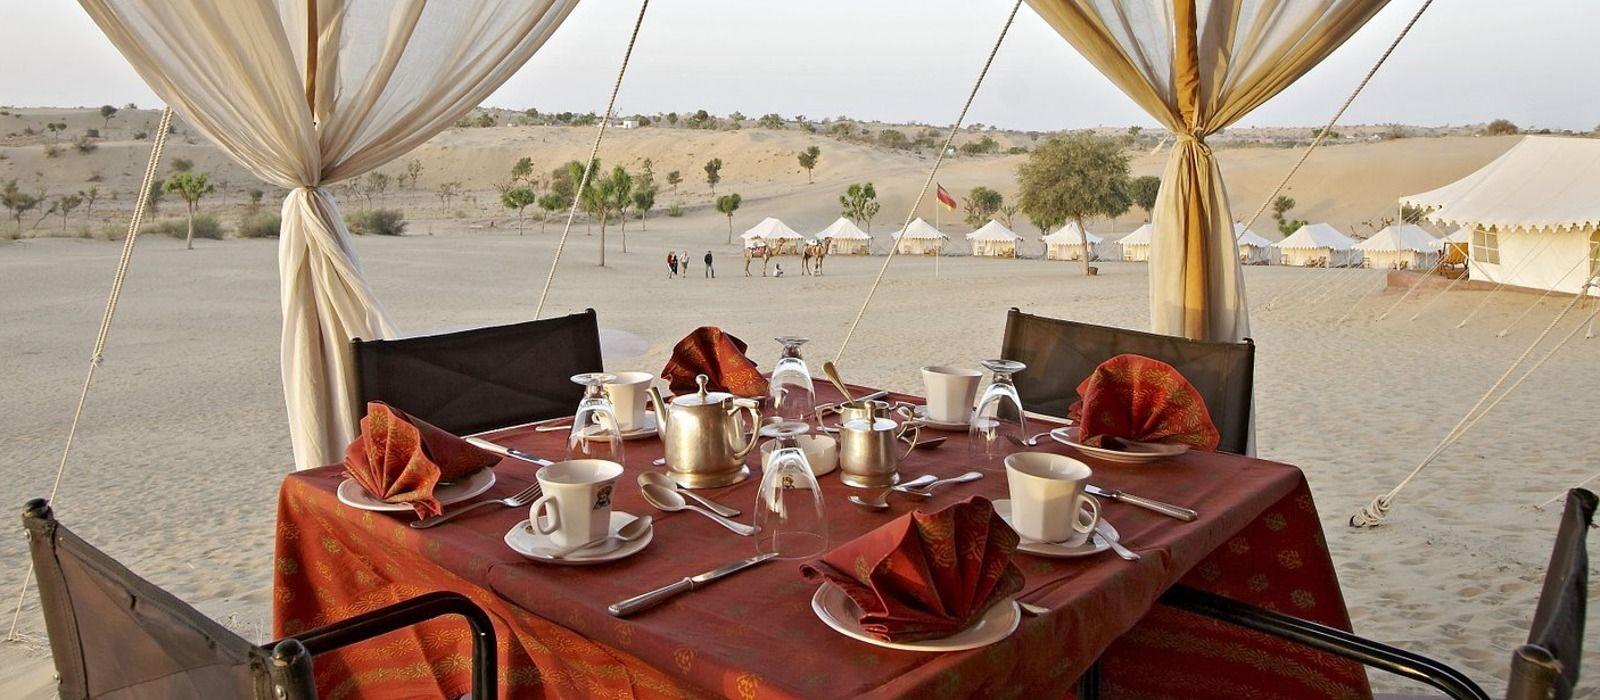 Hotel Manvar Desert Camp & Resort North India